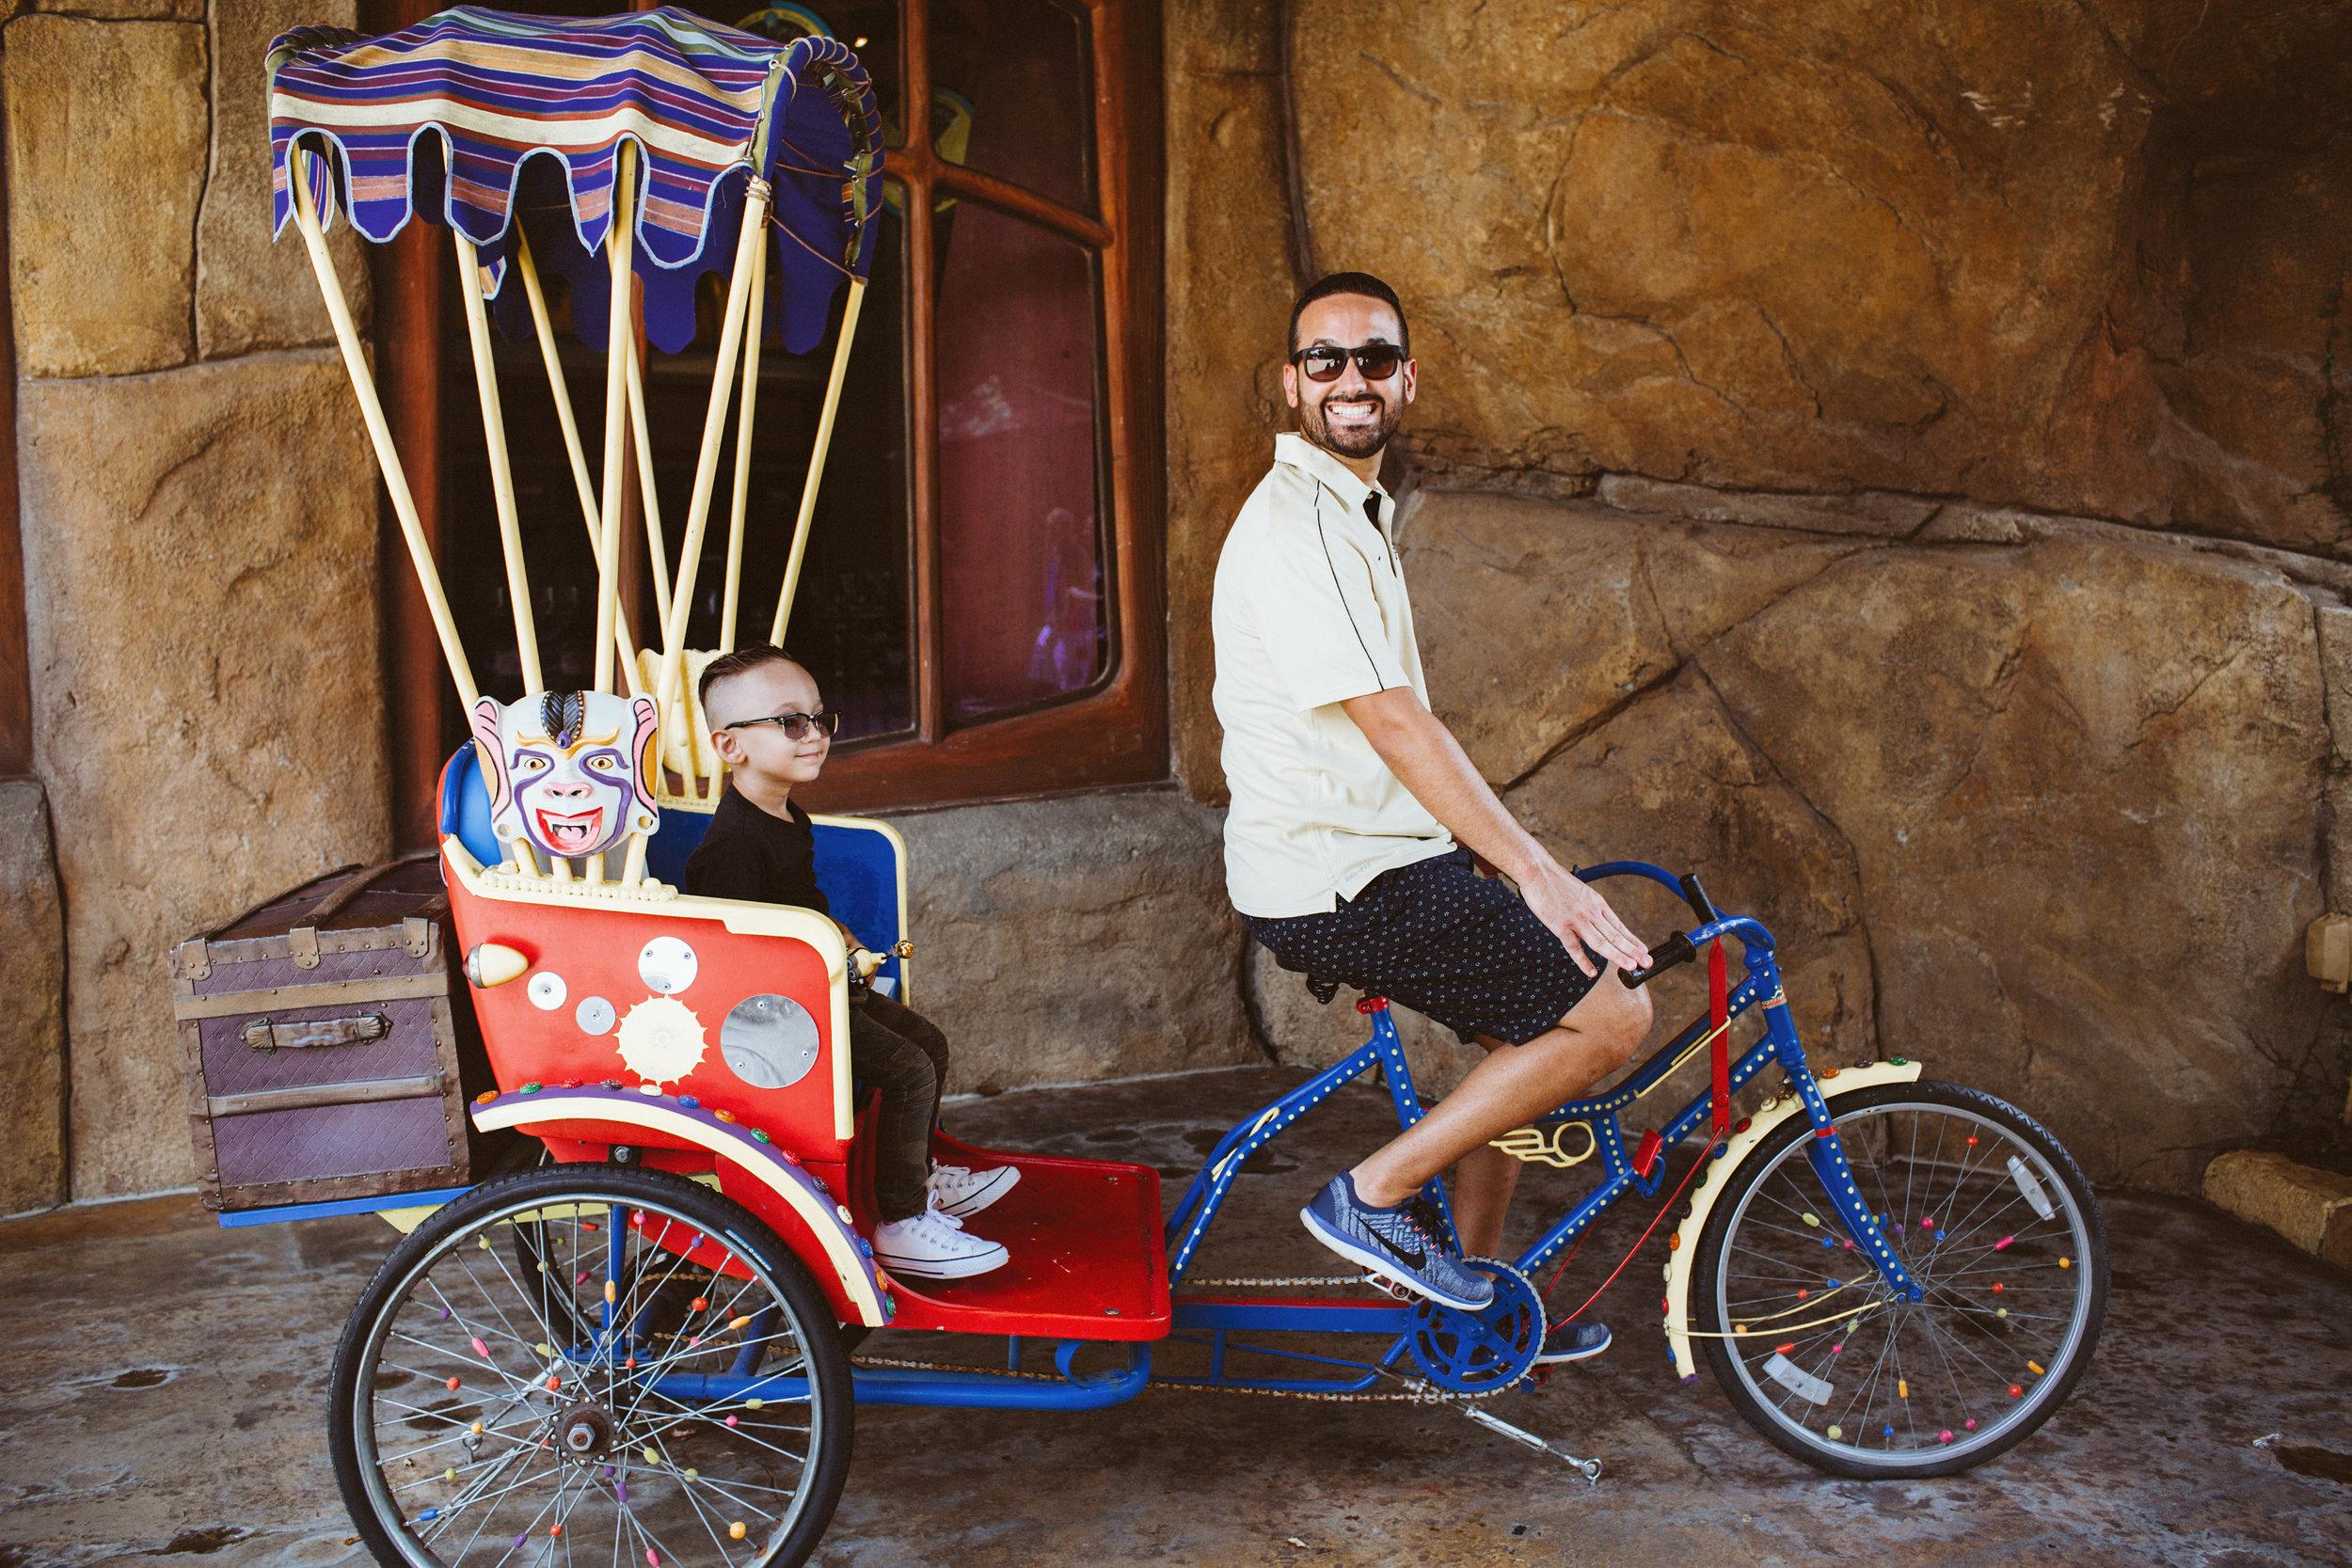 Universal Orlando | Vanessa Boy Photography | vanessaboy.com |-14.com |final2.jpg